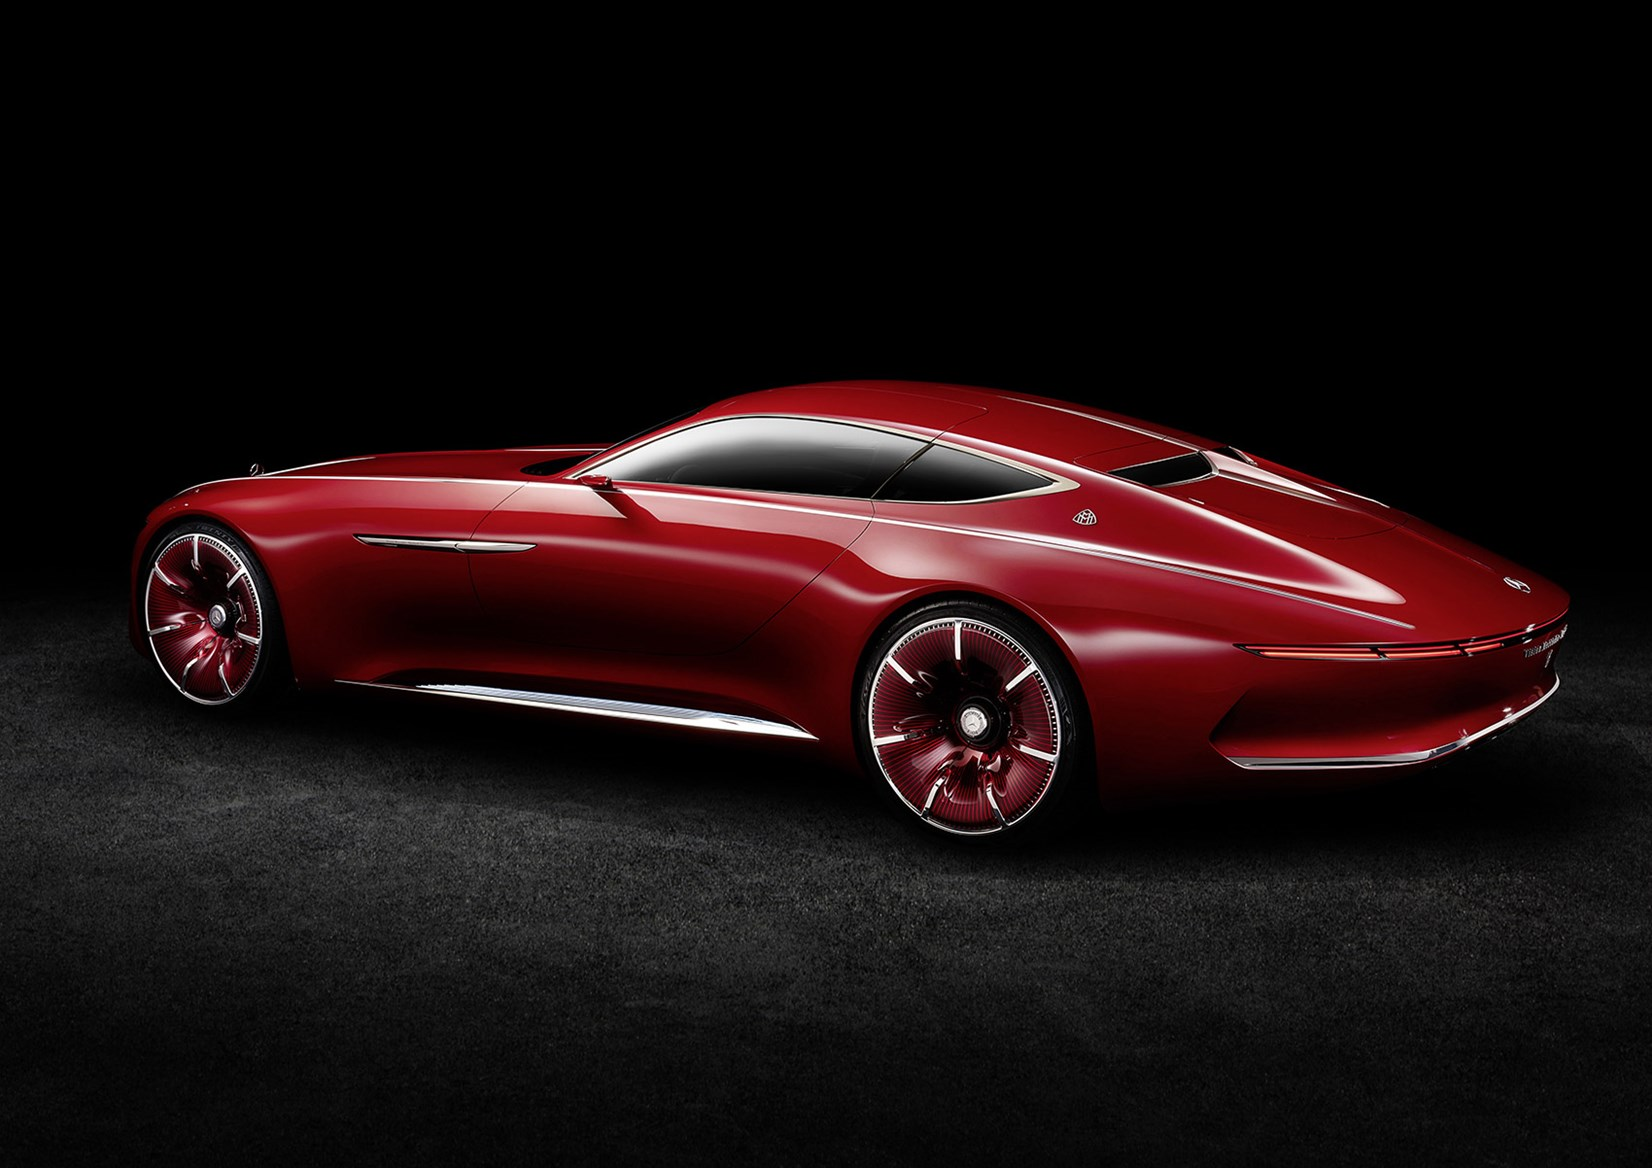 Vision Mercedes Maybach 6 News Photos by CAR Magazine 1652x1168